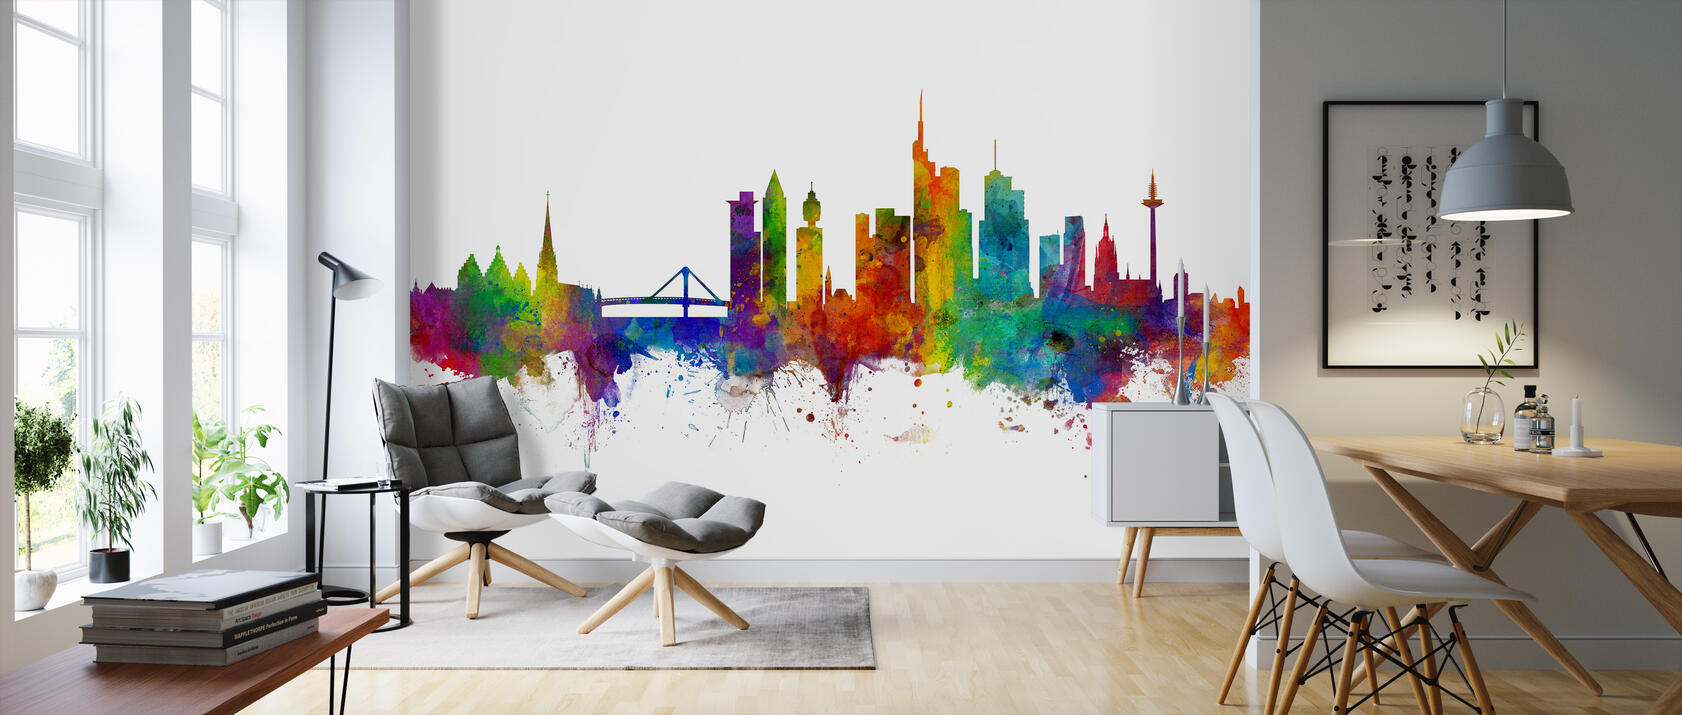 frankfurt skyline beliebte fototapete photowall. Black Bedroom Furniture Sets. Home Design Ideas